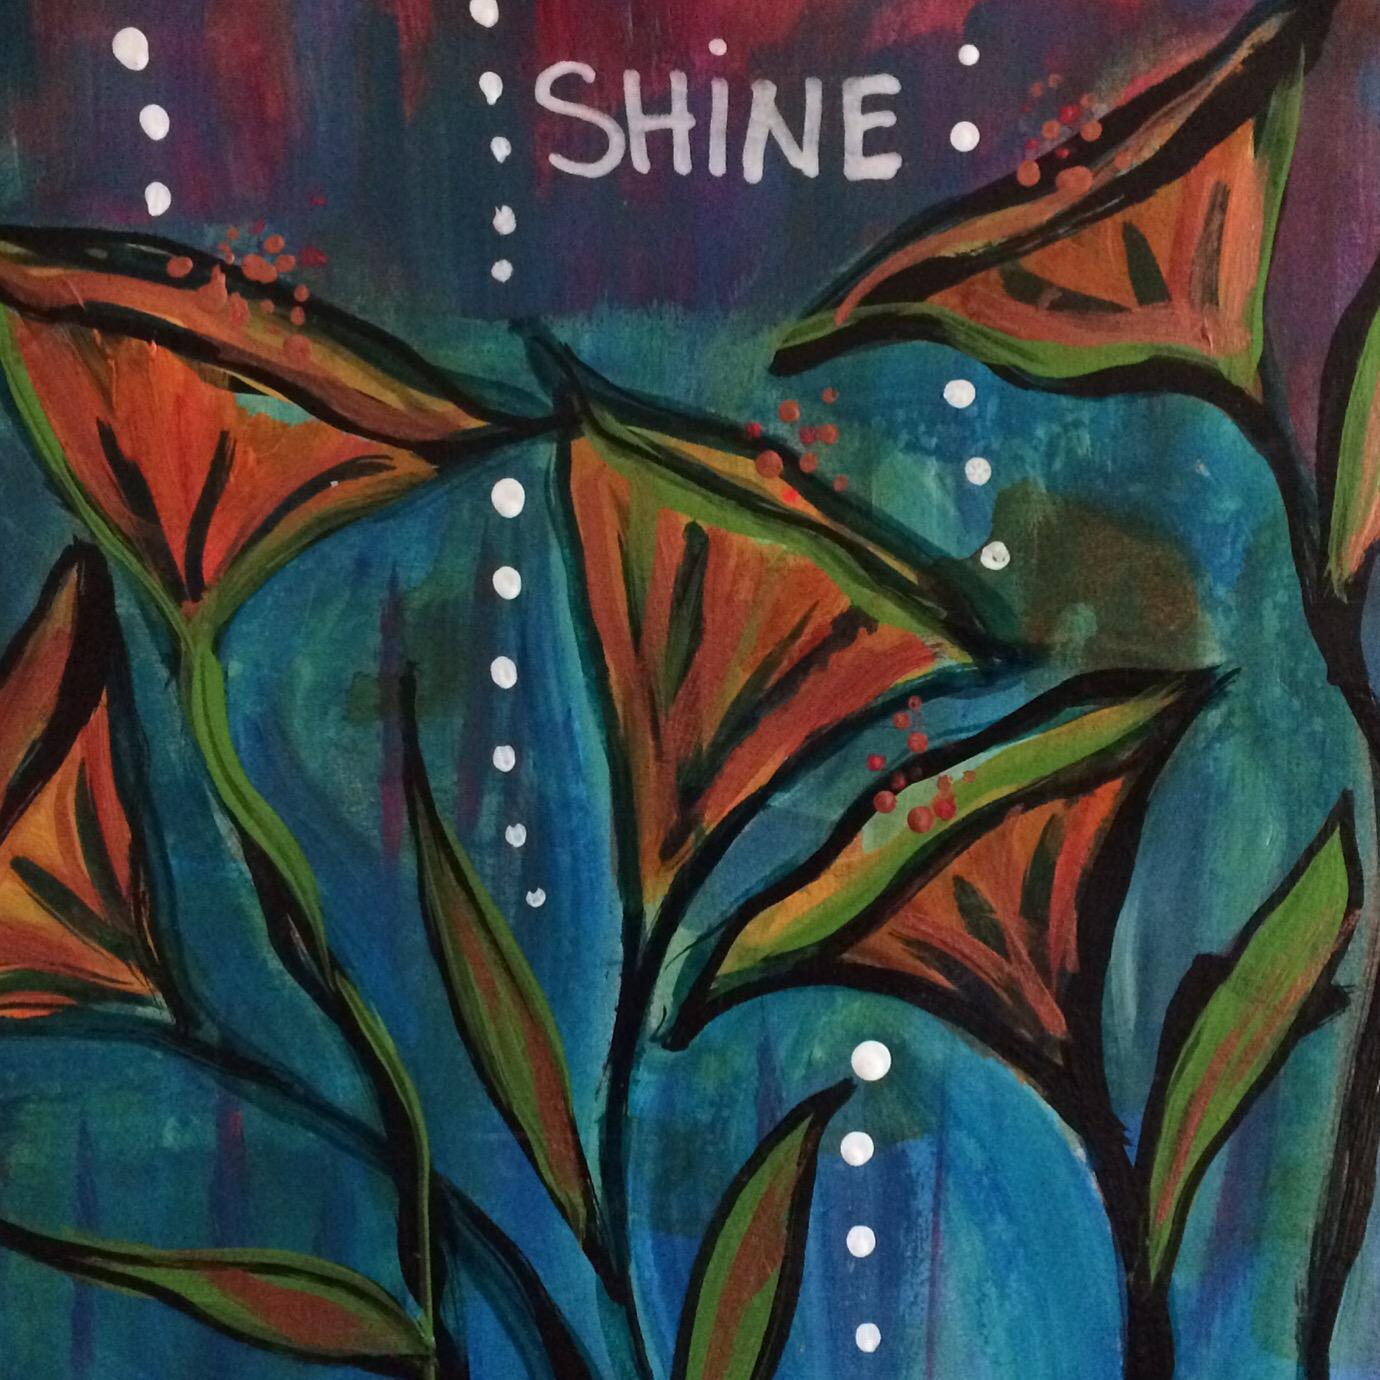 Shine by Nicole Edgecombe